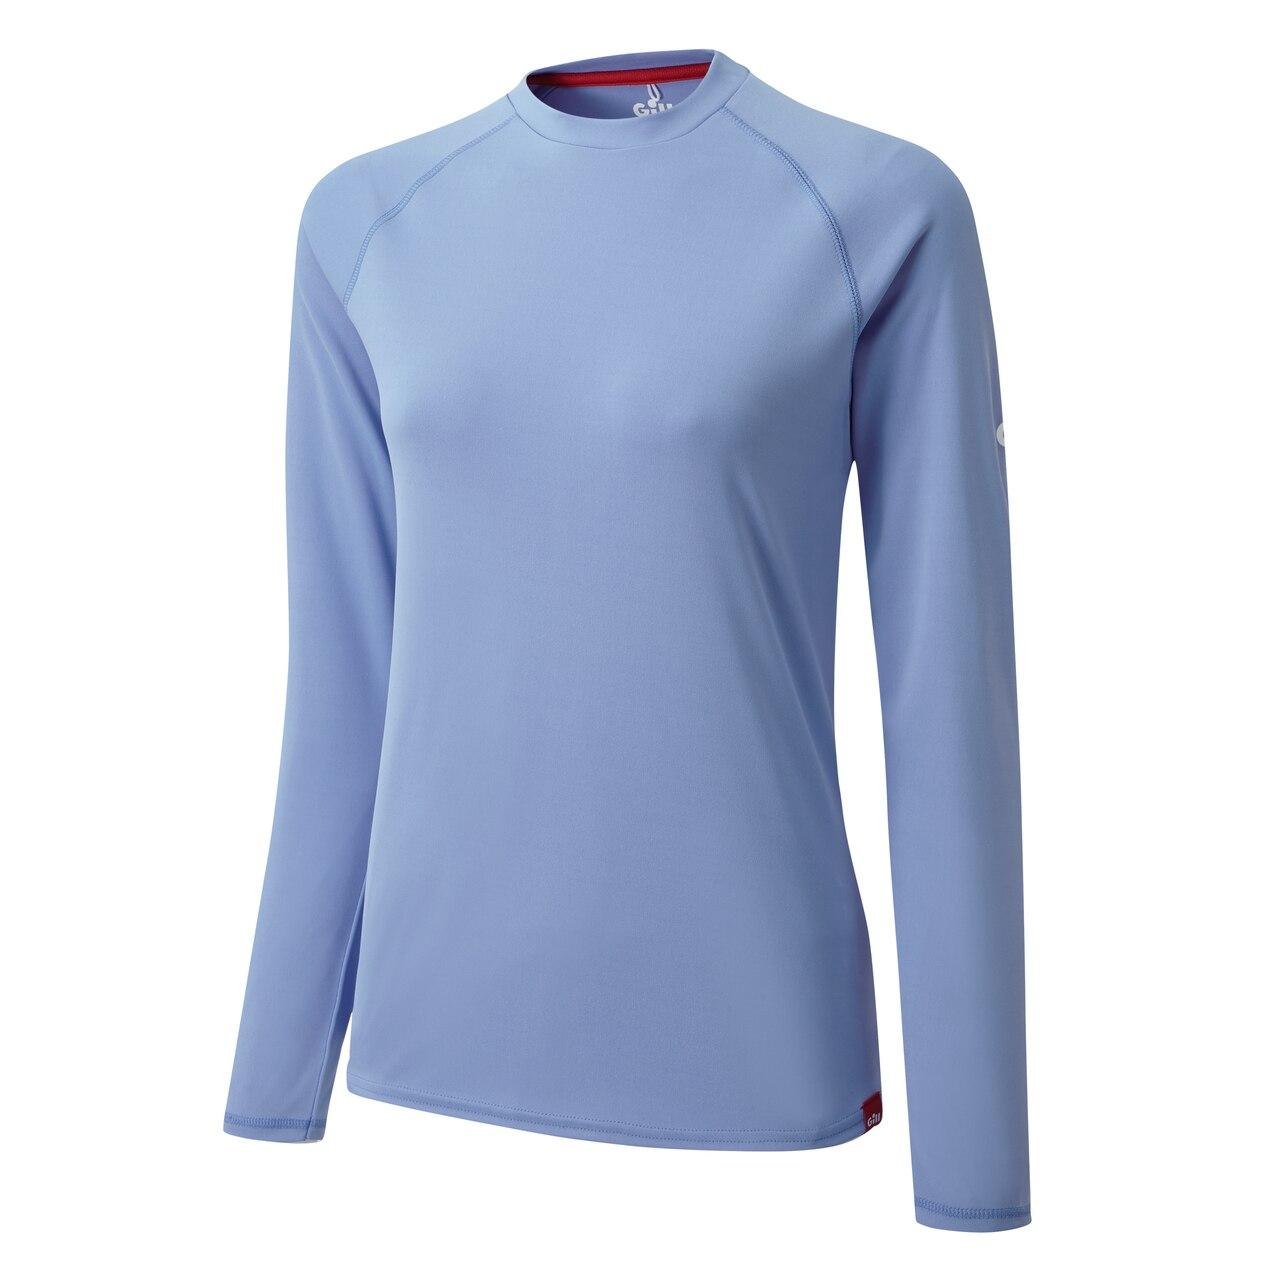 Women's UV Tec Long Sleeve Tee - UV011W-BLU18-2.jpg